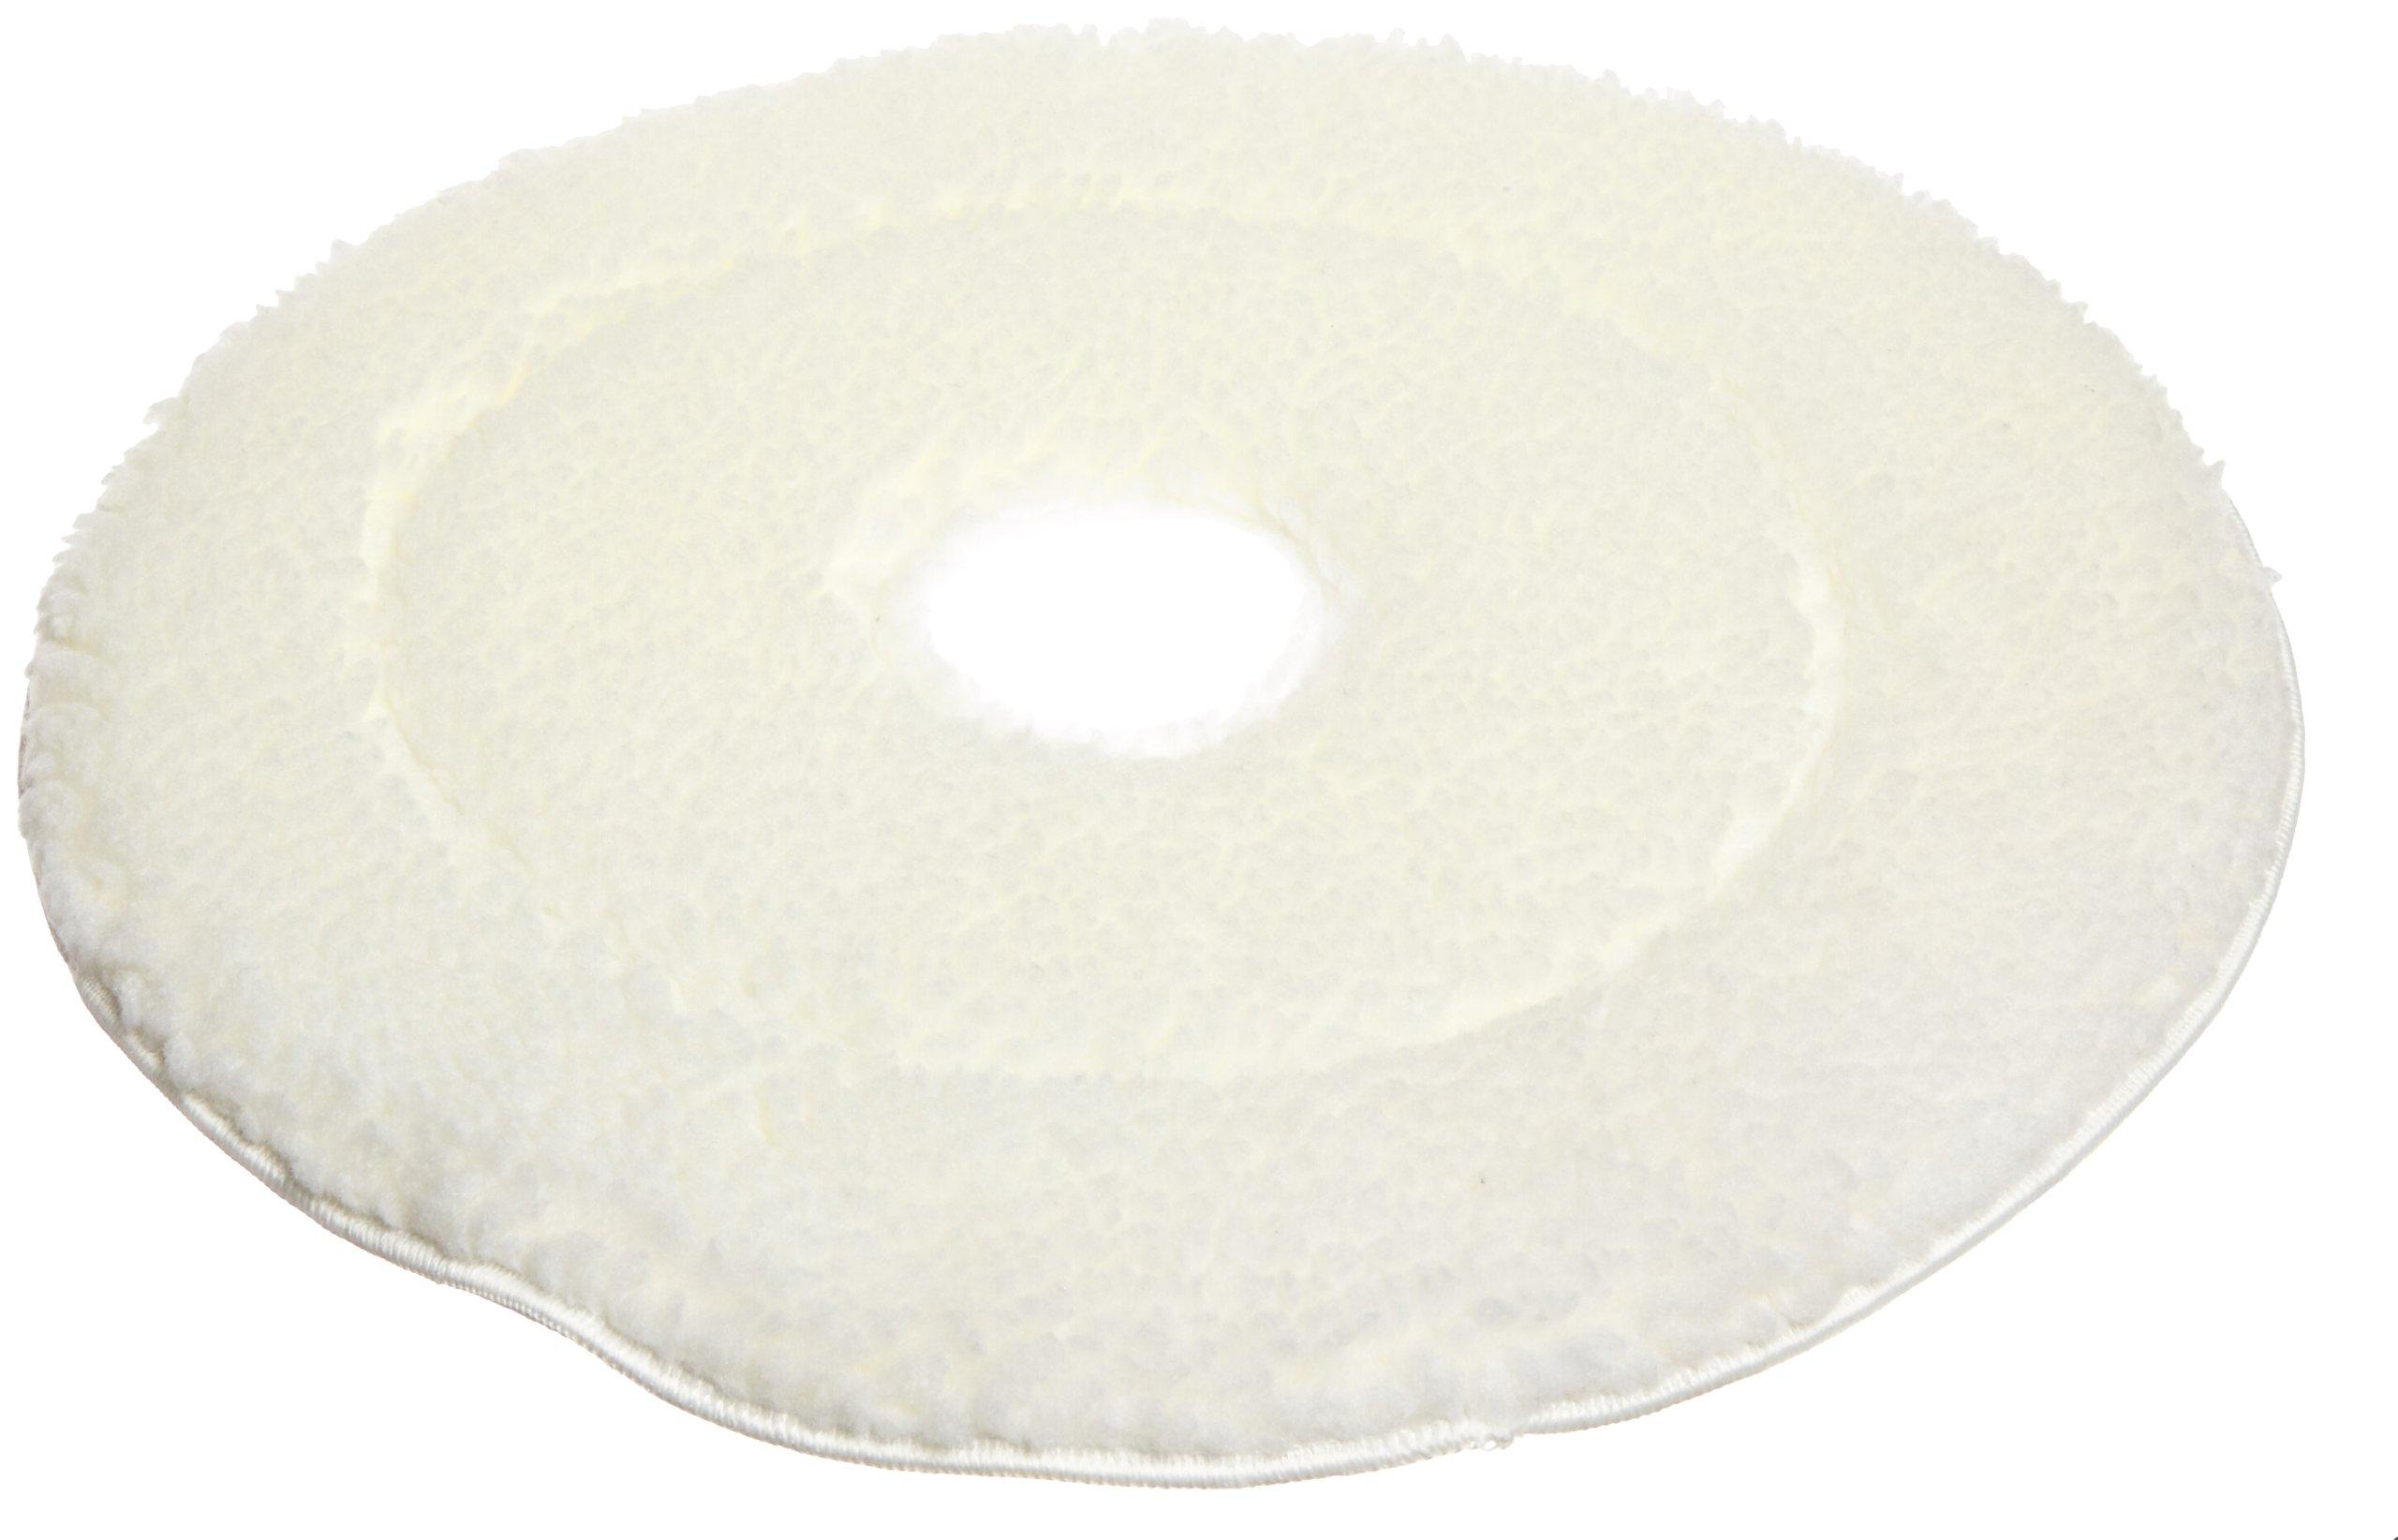 Impact BURN19S Microfiber High Speed Burnishing Pad, 19'' Diameter, White (Case of 5)